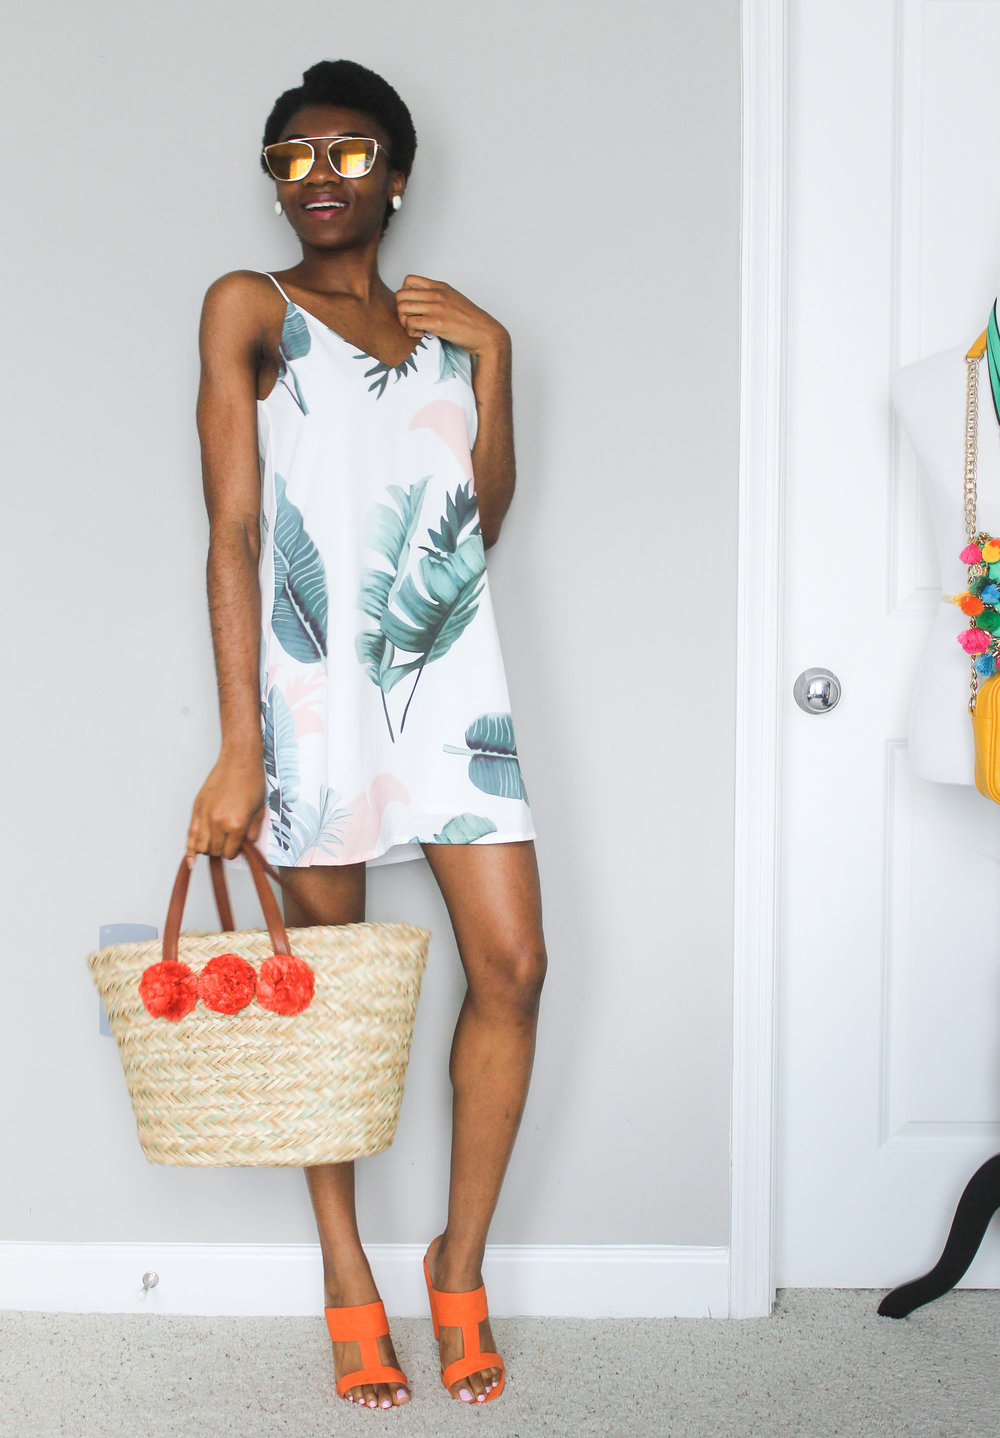 4WaystoWear-tropical-prints-dress 29.jpg